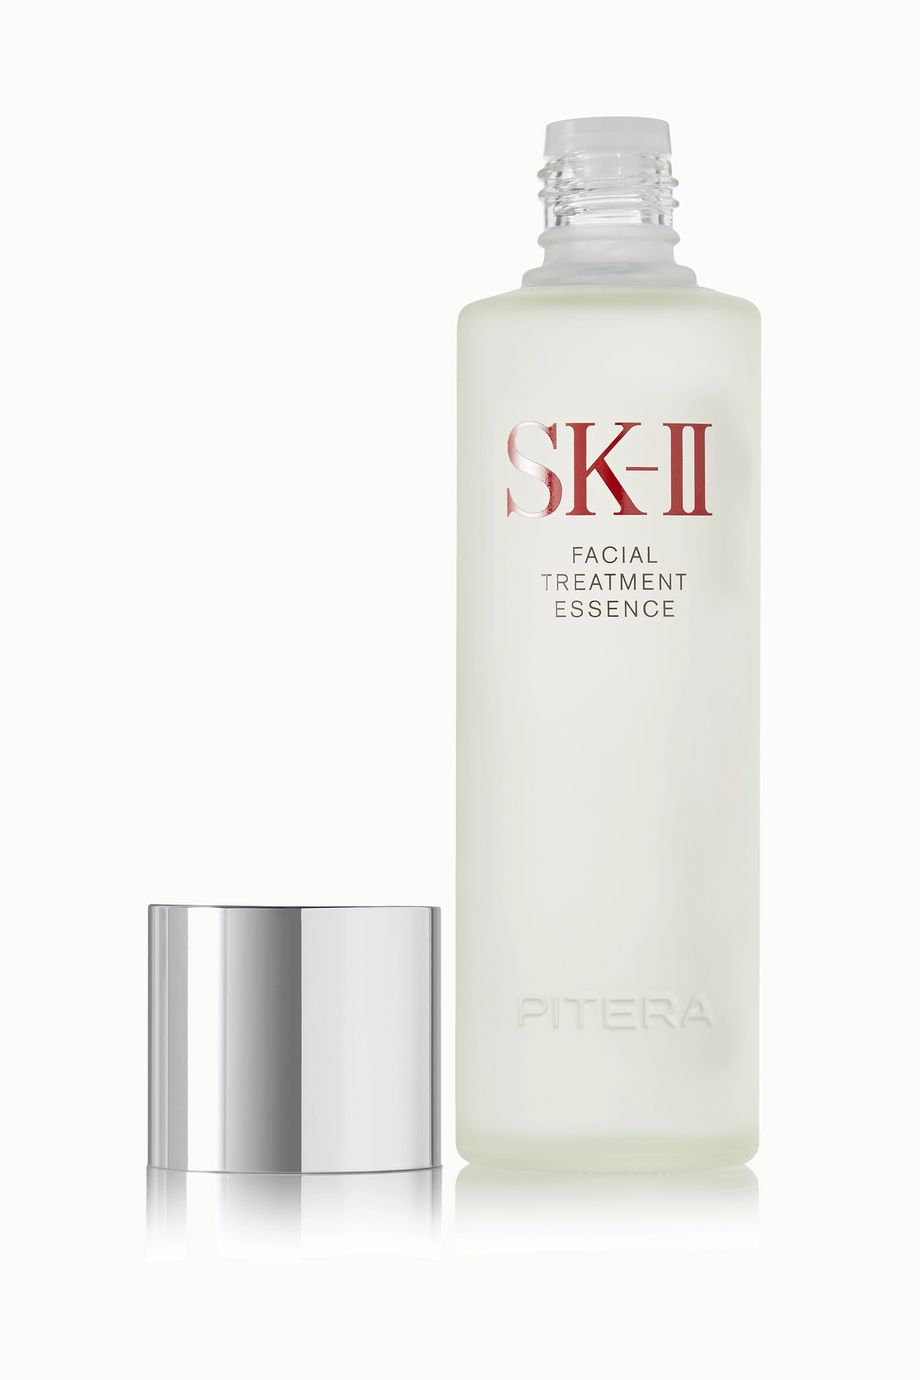 SK-II Facial Treatment Essence, 160ml